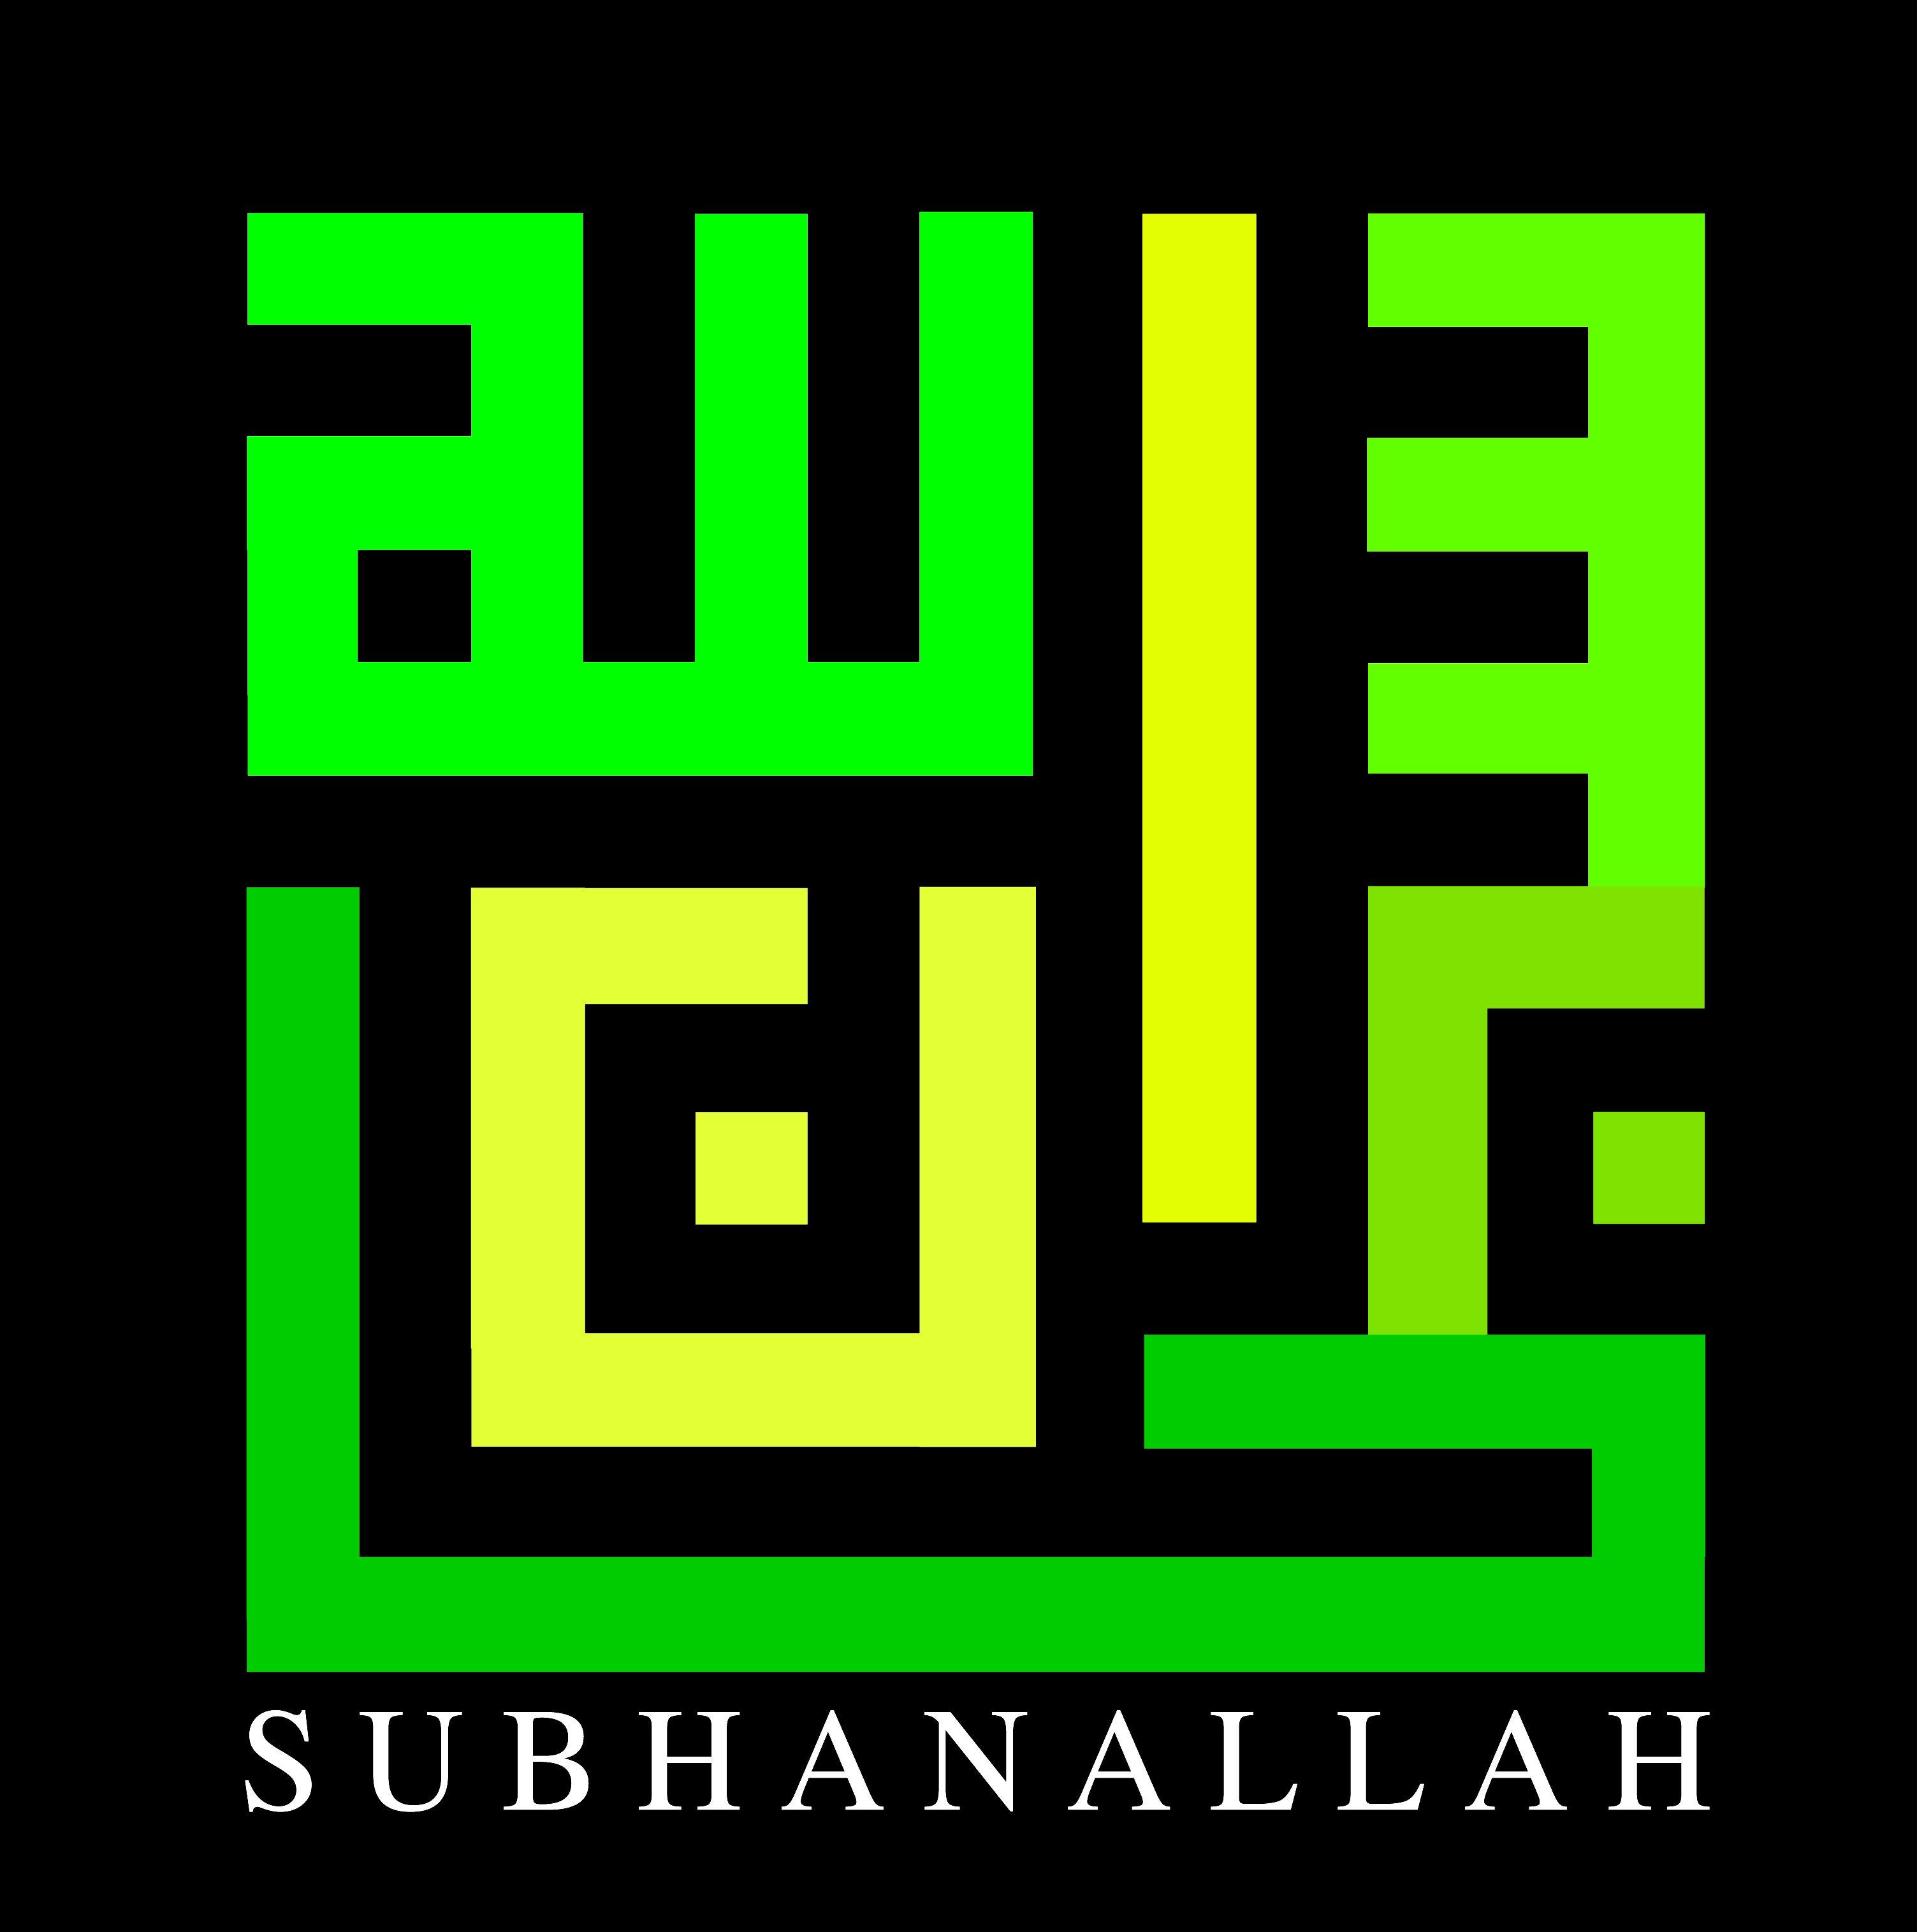 Subhanallah kufi art pinterest islamic calligraphy